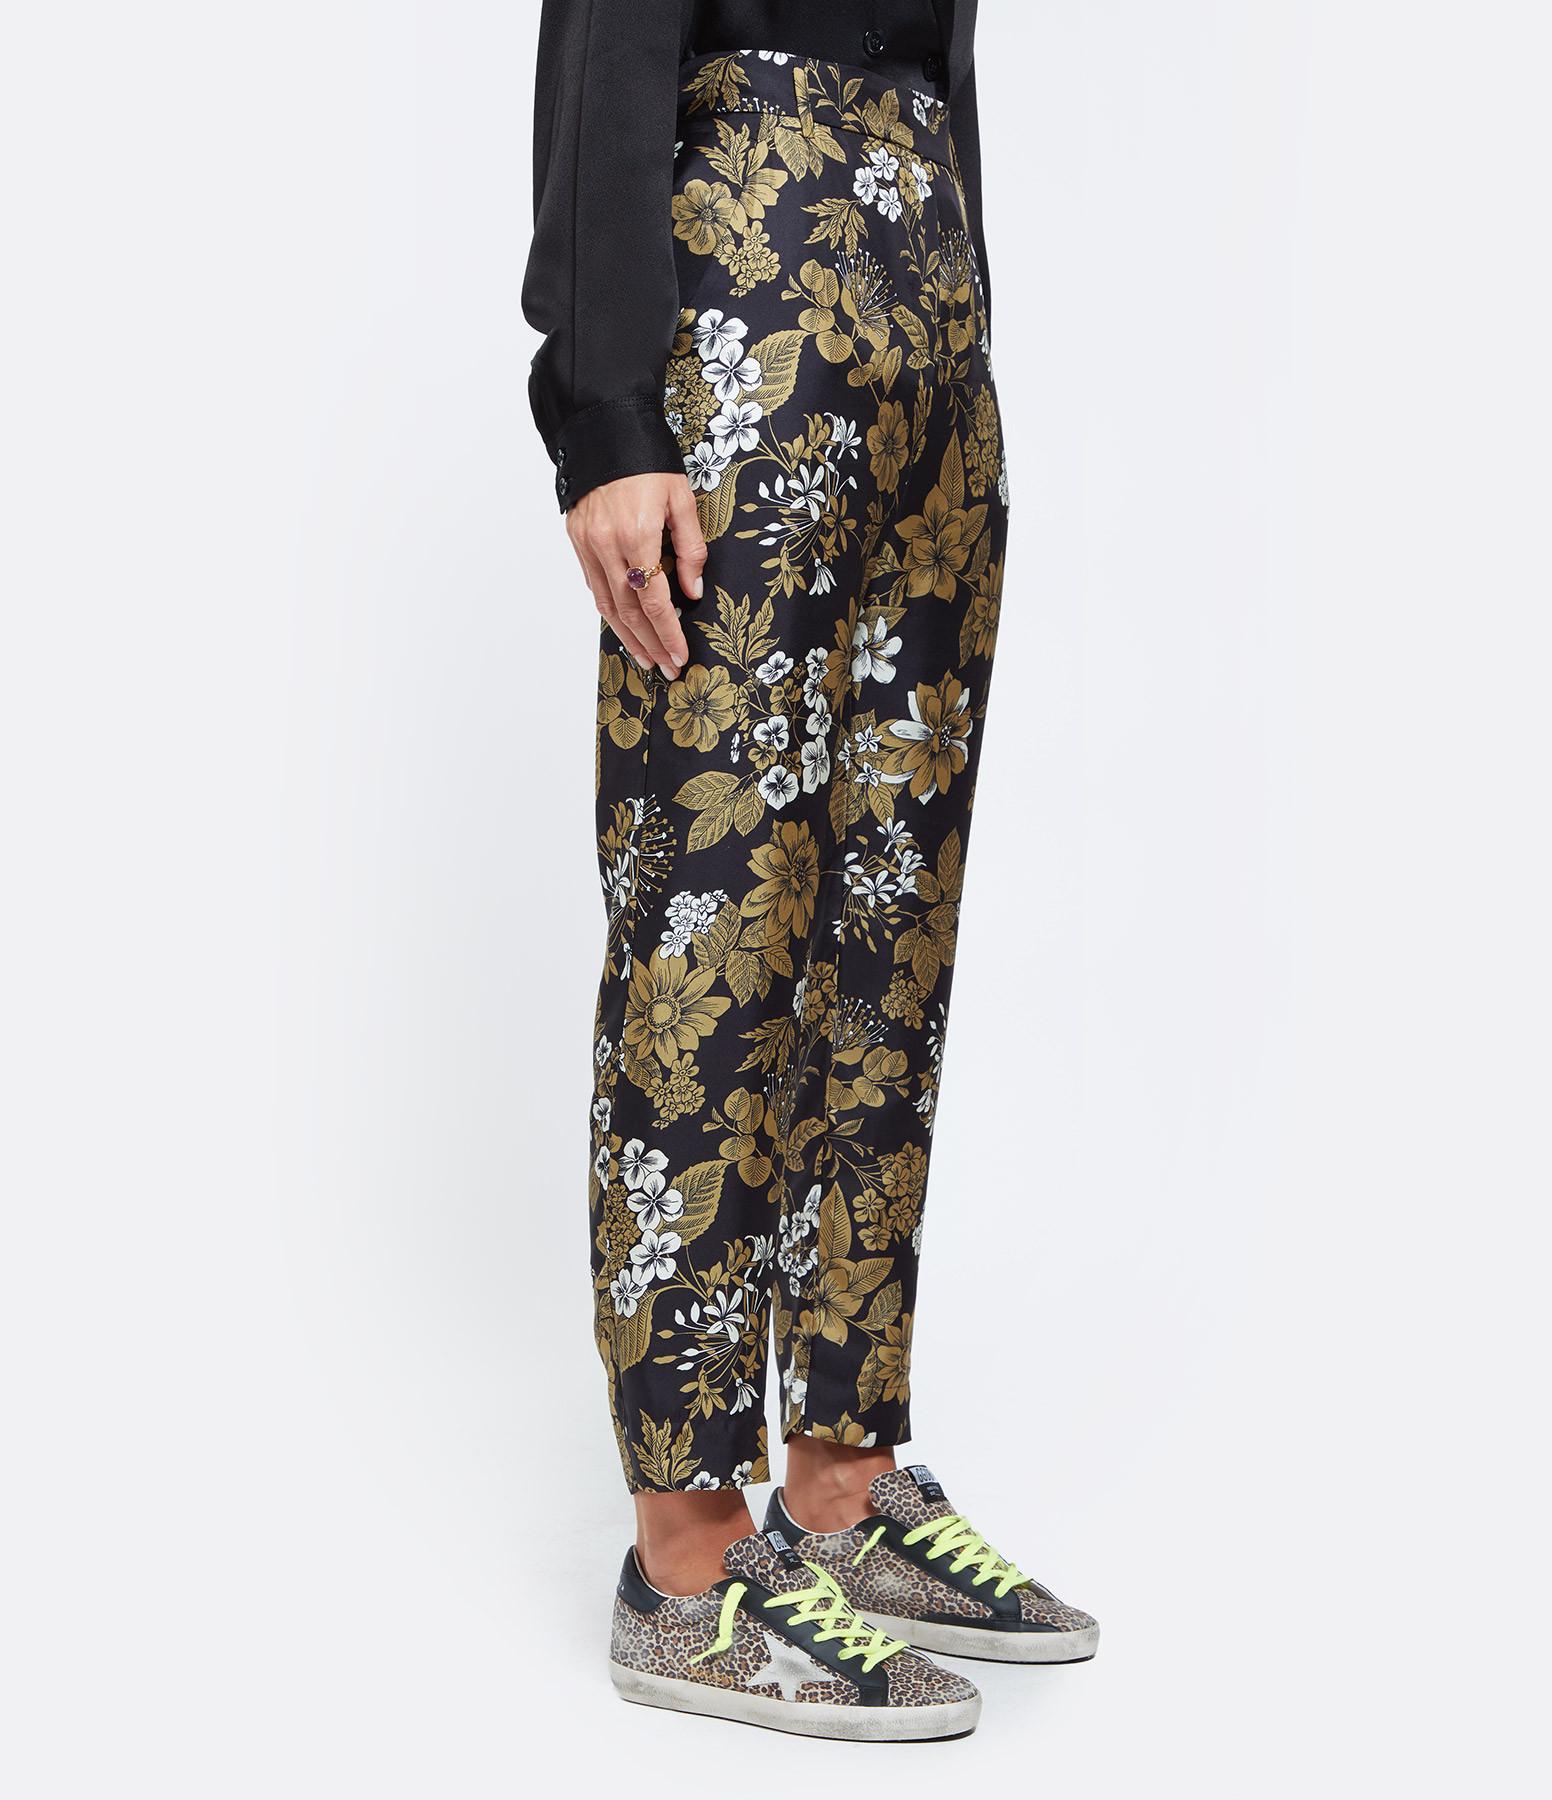 MOMONI - Pantalon Avena Soie Noir Tabac